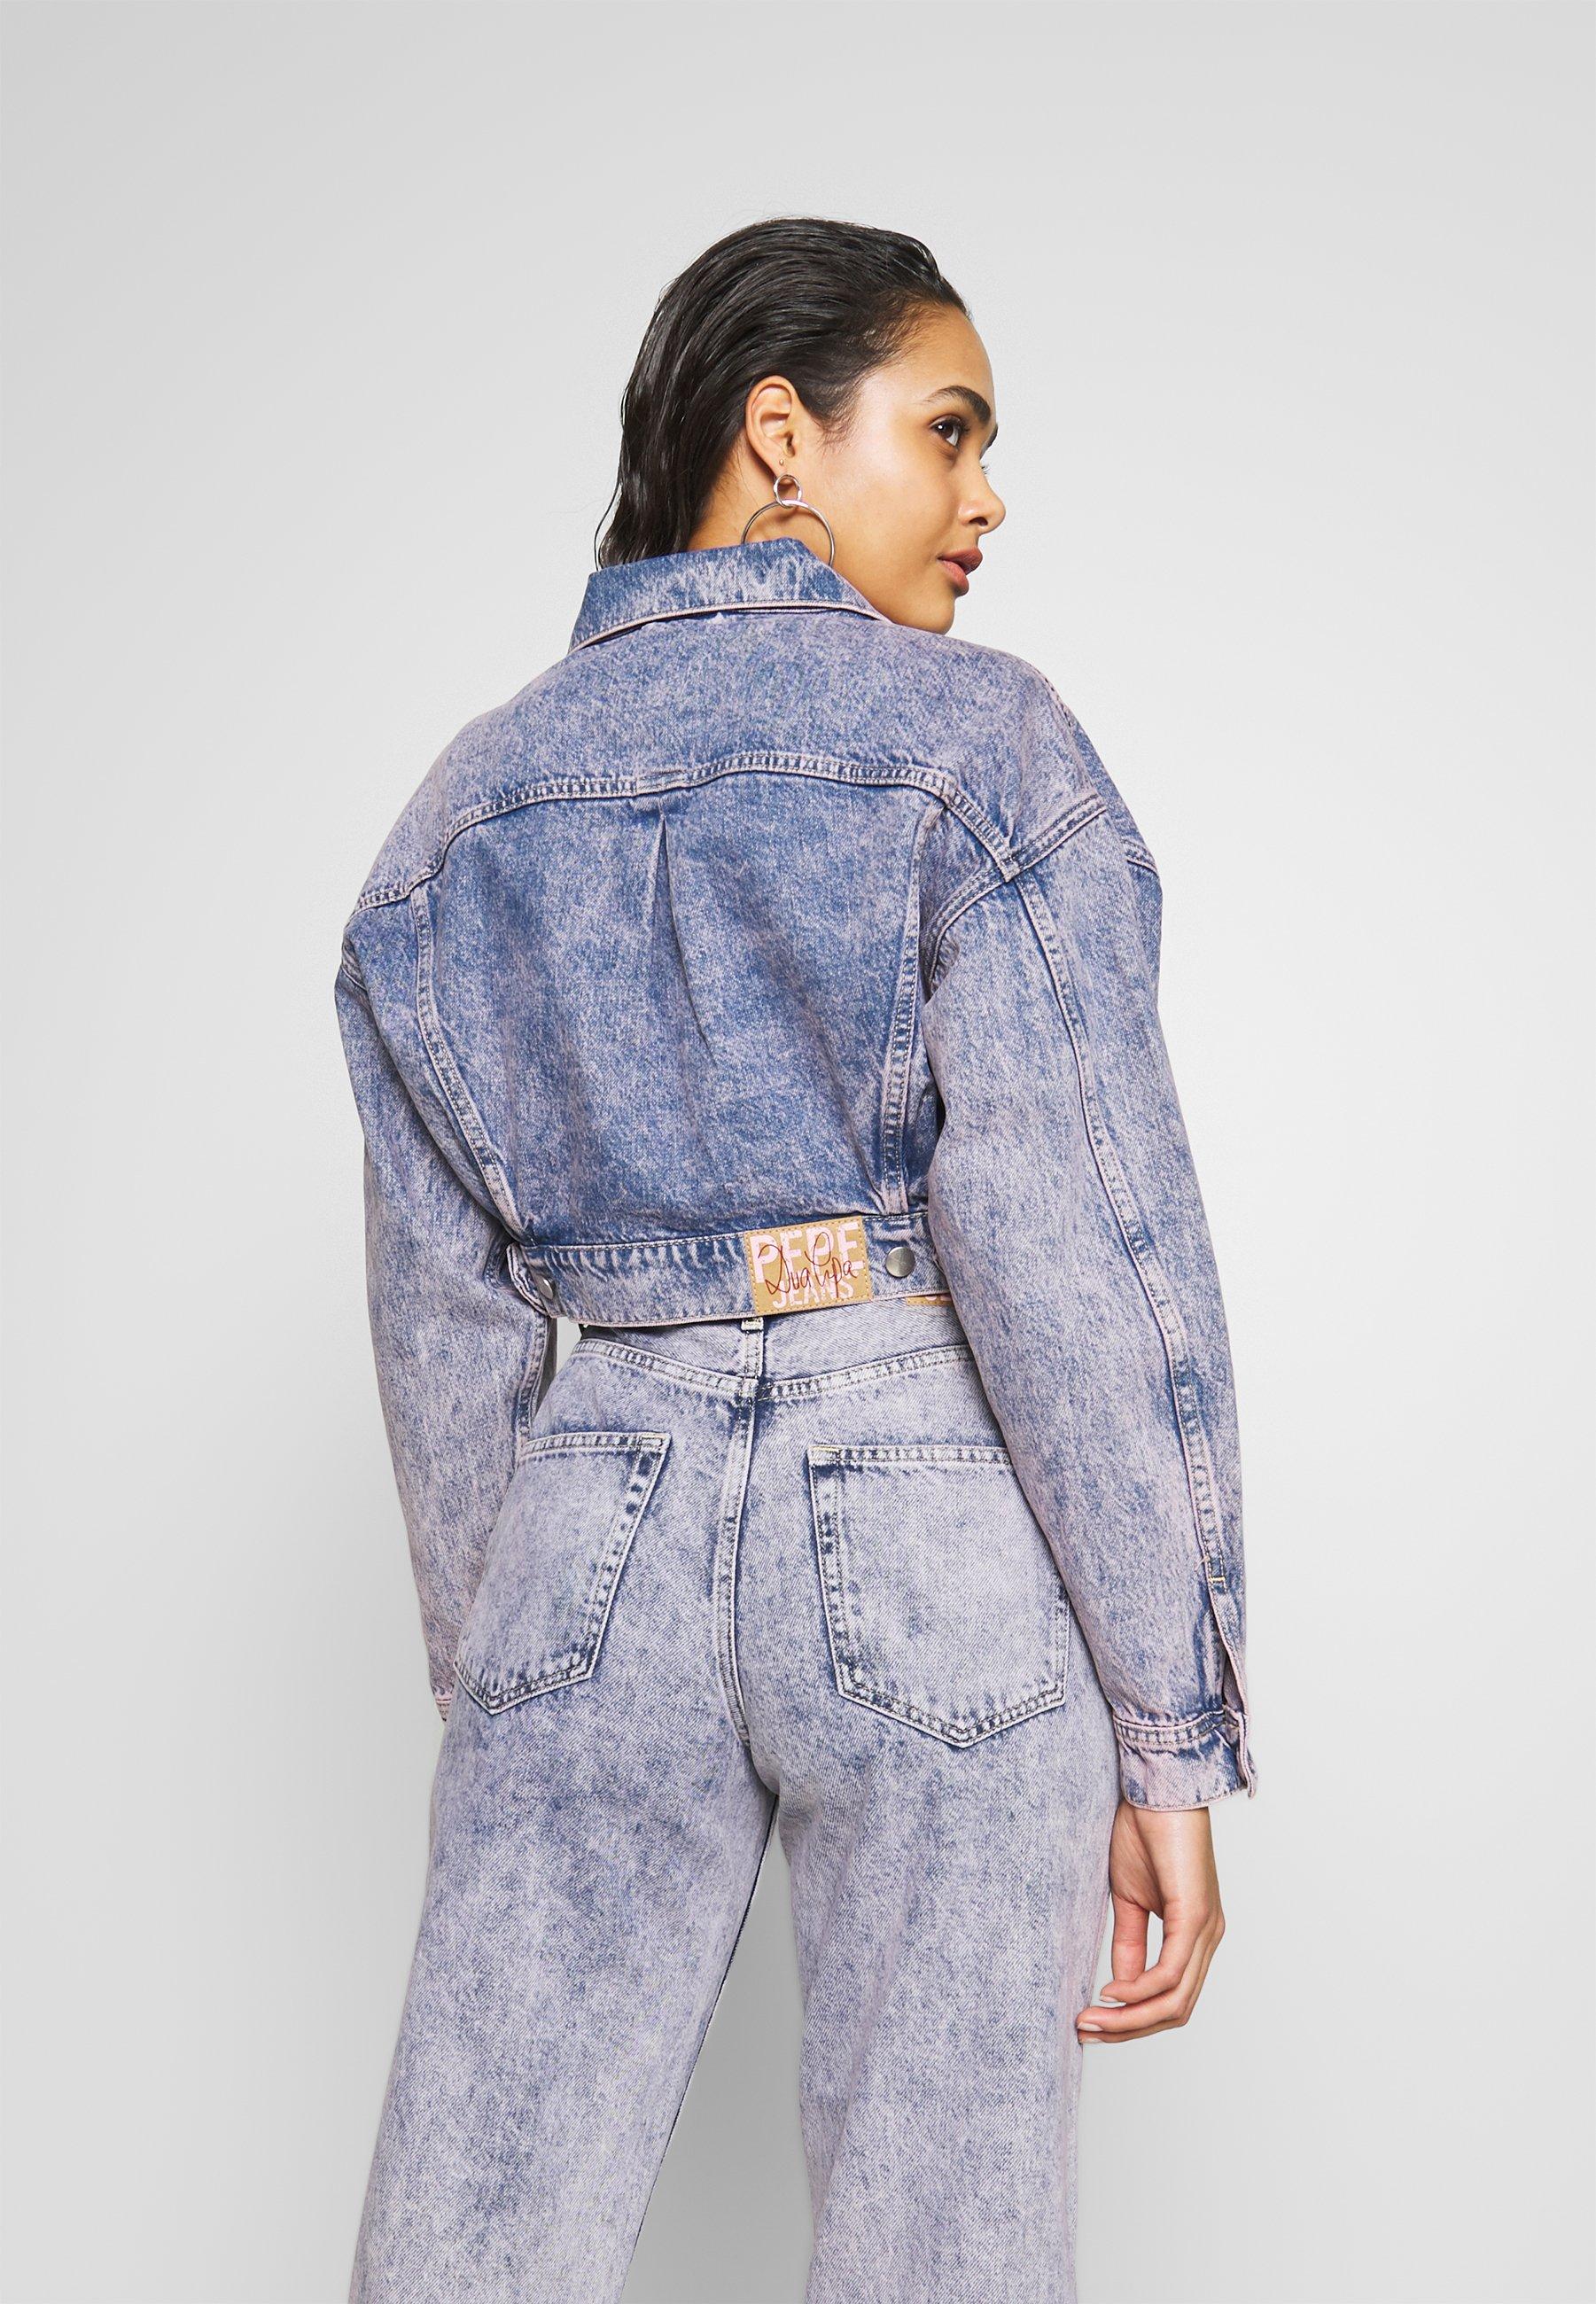 Pepe Jeans DUA LIPA x PEPE JEANS - Veste en jean - denim - Vestes Femme INP1V